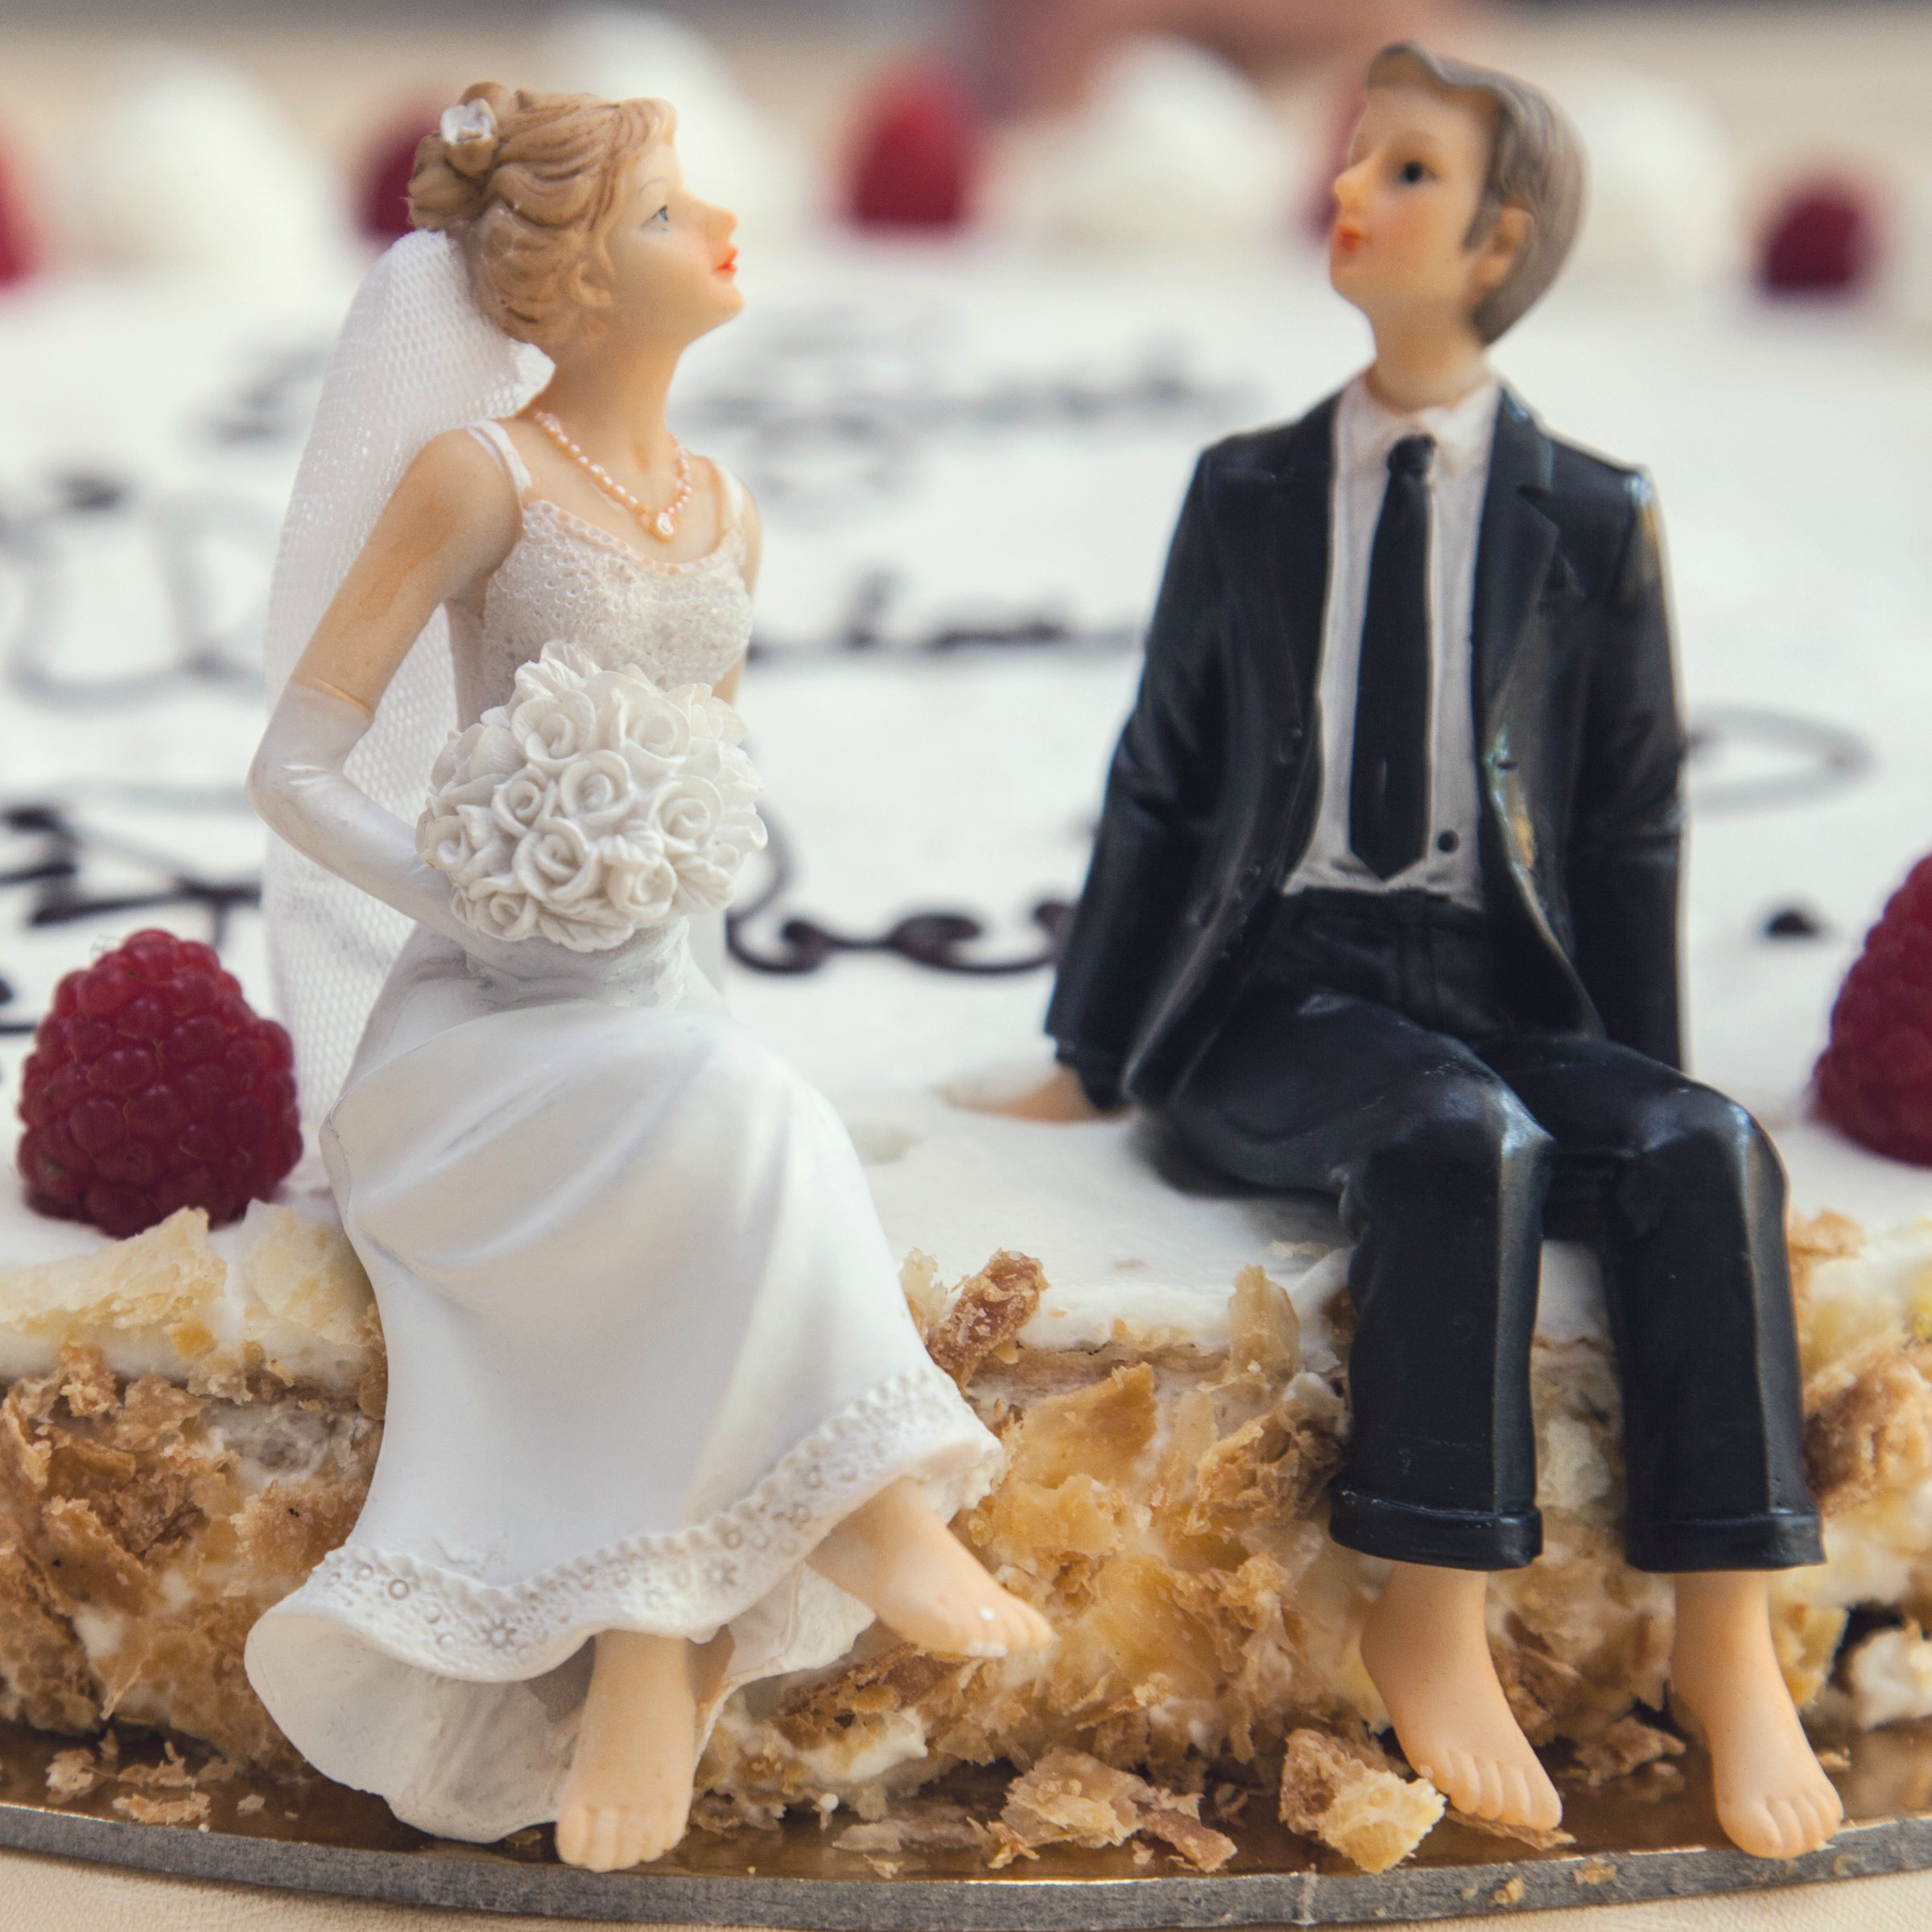 Wedding Planning: 5 Ways To Avoid Becoming Bridezilla